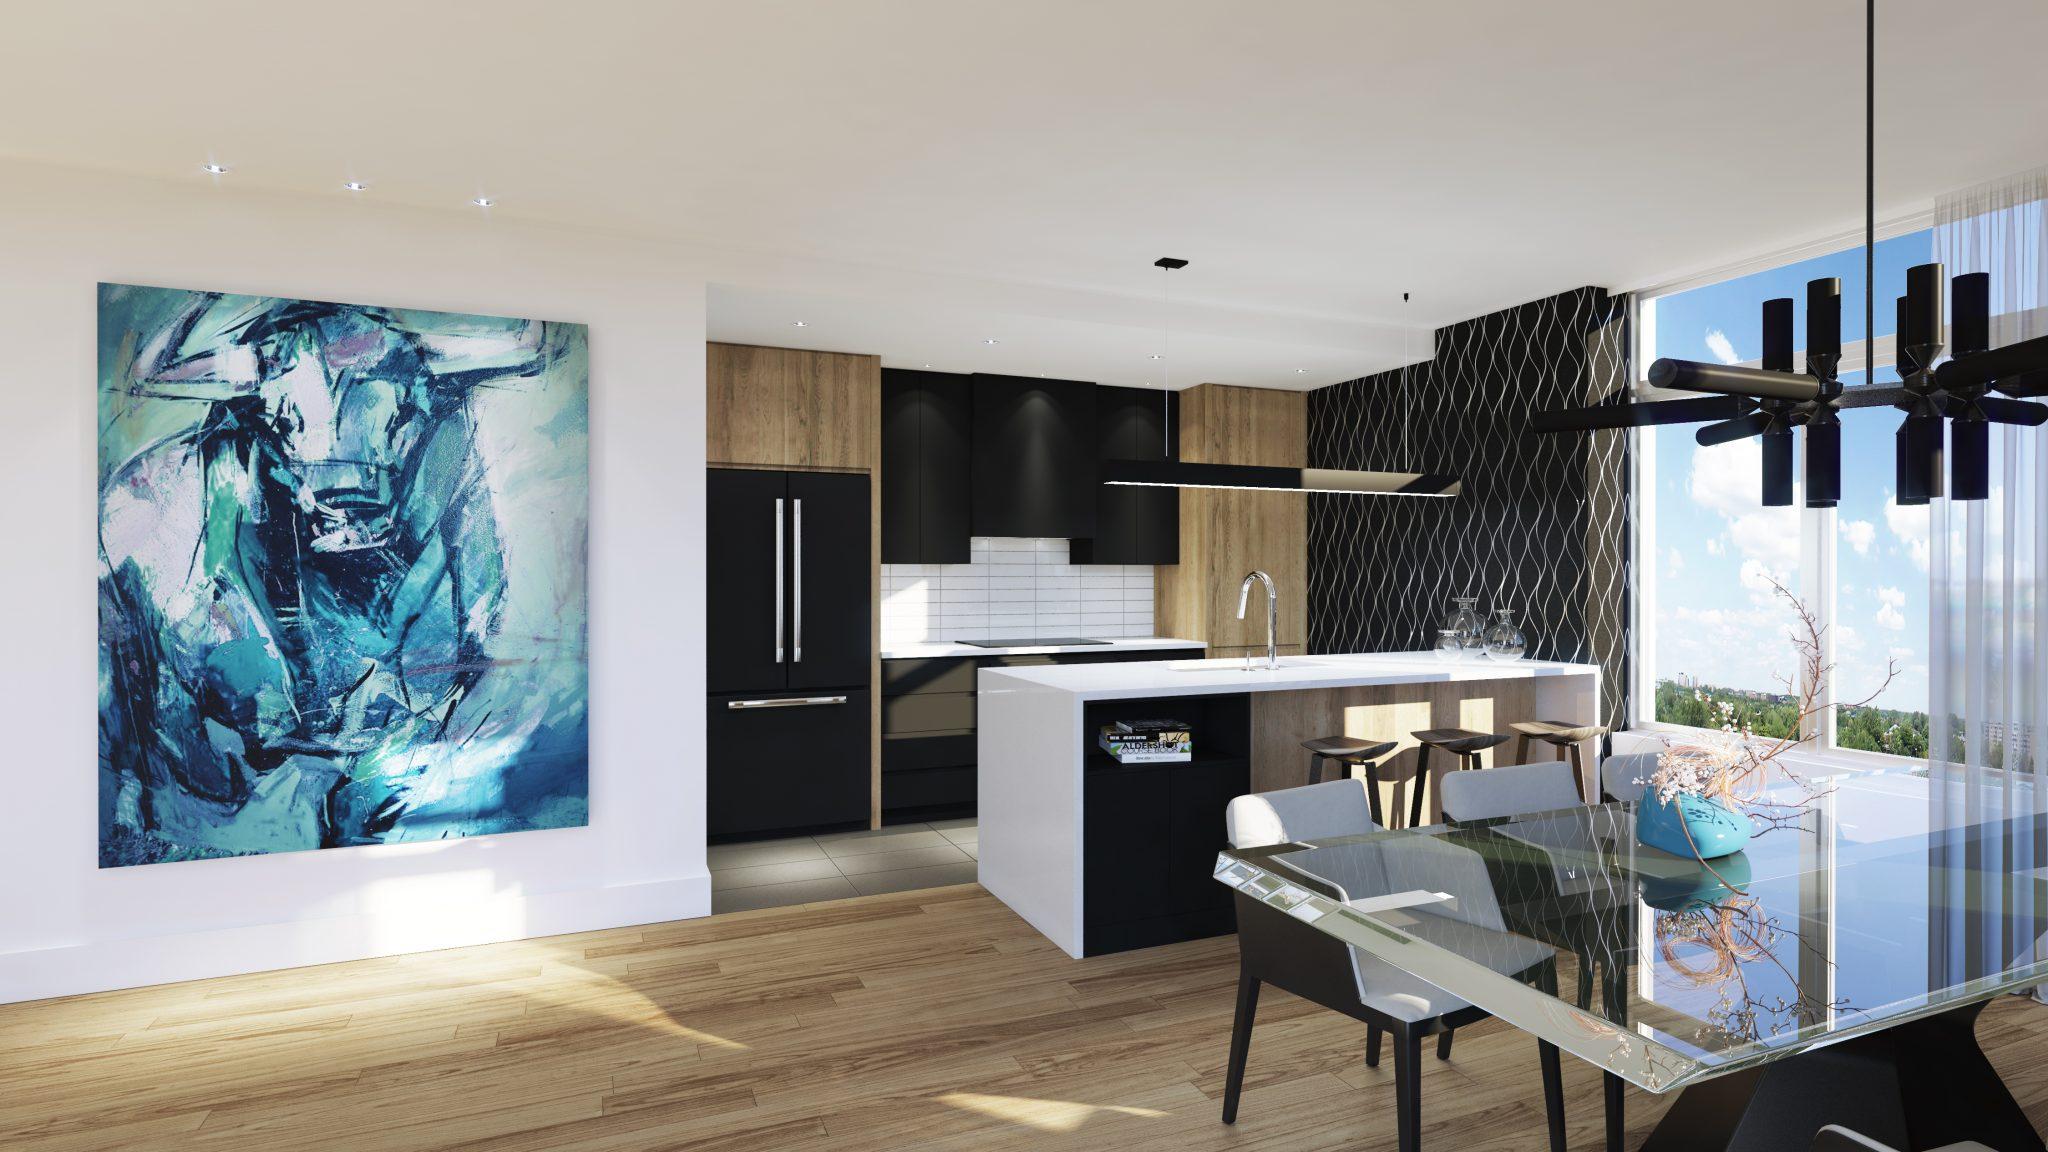 Penthouse - Skyblü - Condos neufs a vendre a Mirabel